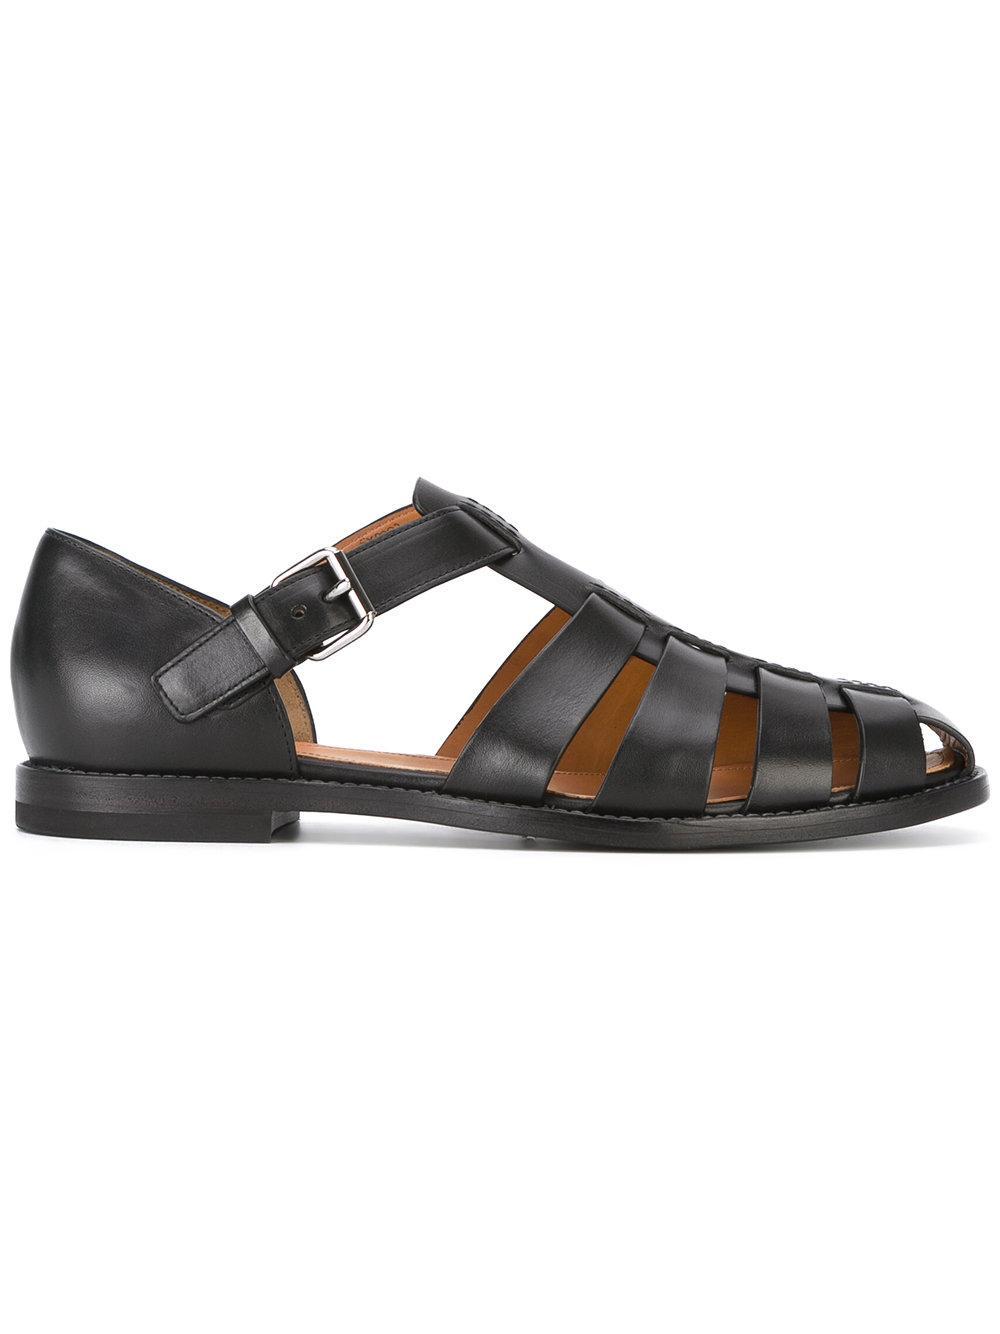 Keen Shoes Uk